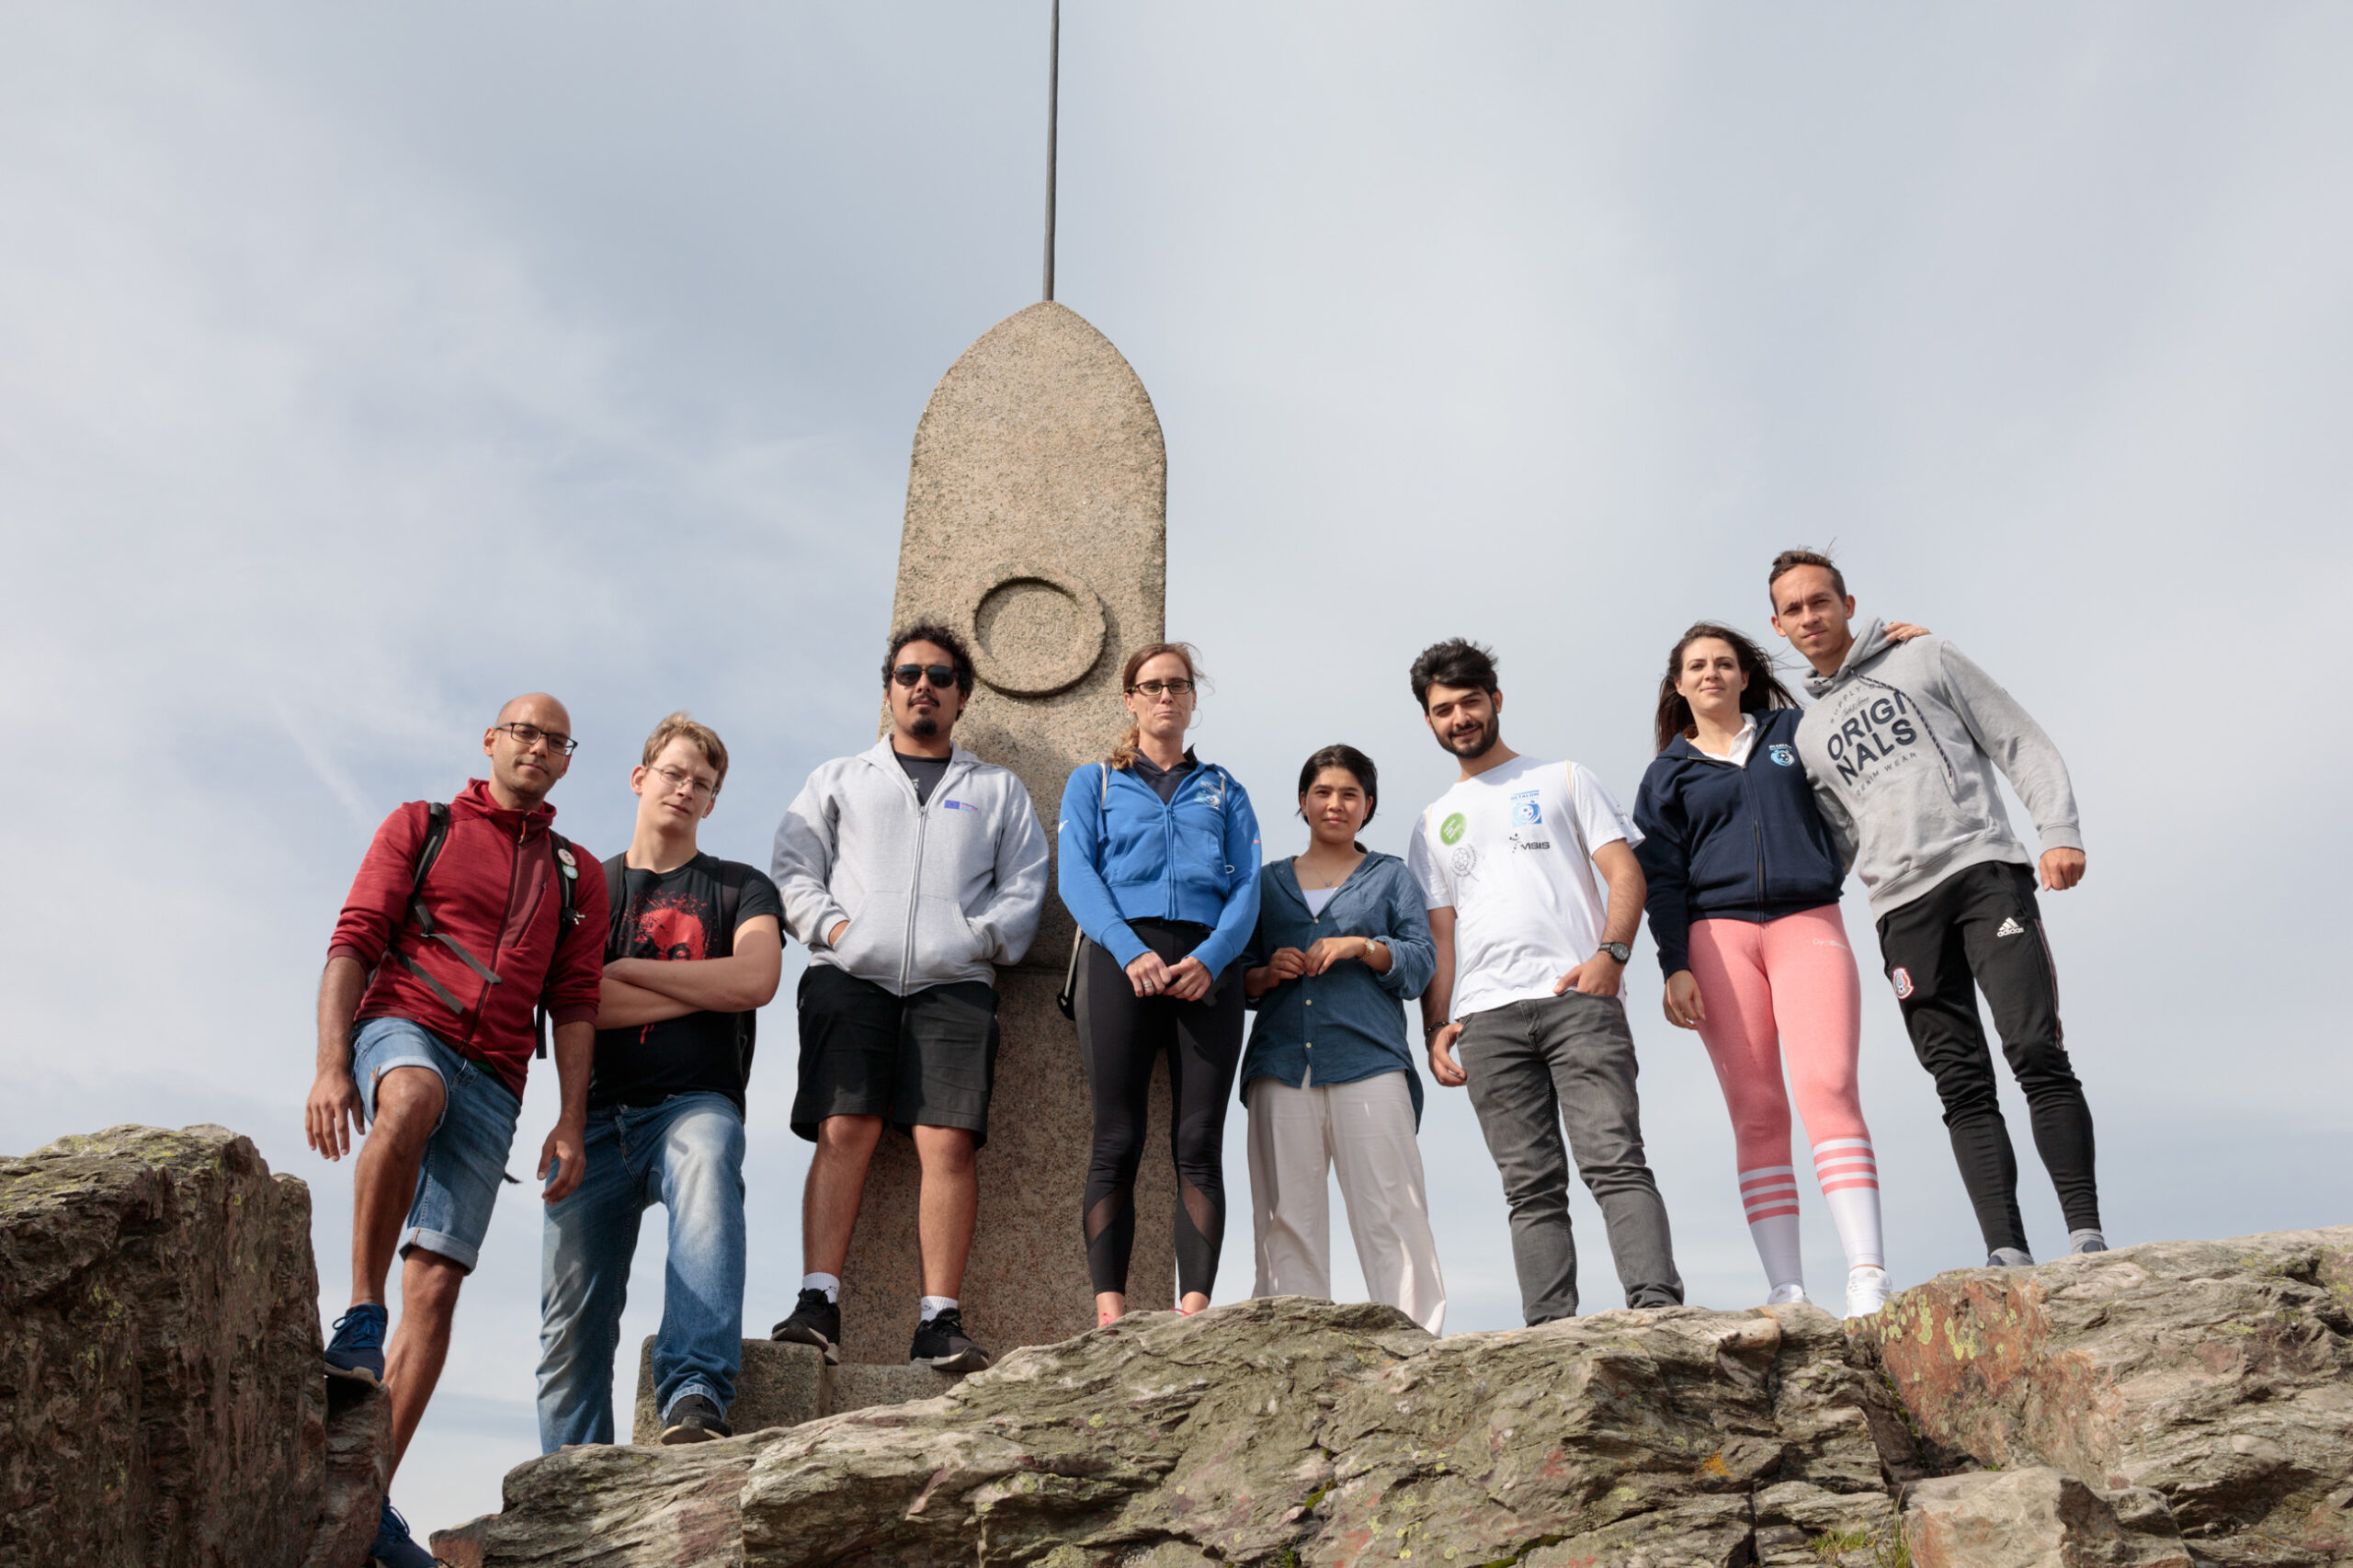 Youth leaders on the trip, Ještěd mountain, Czech Republic